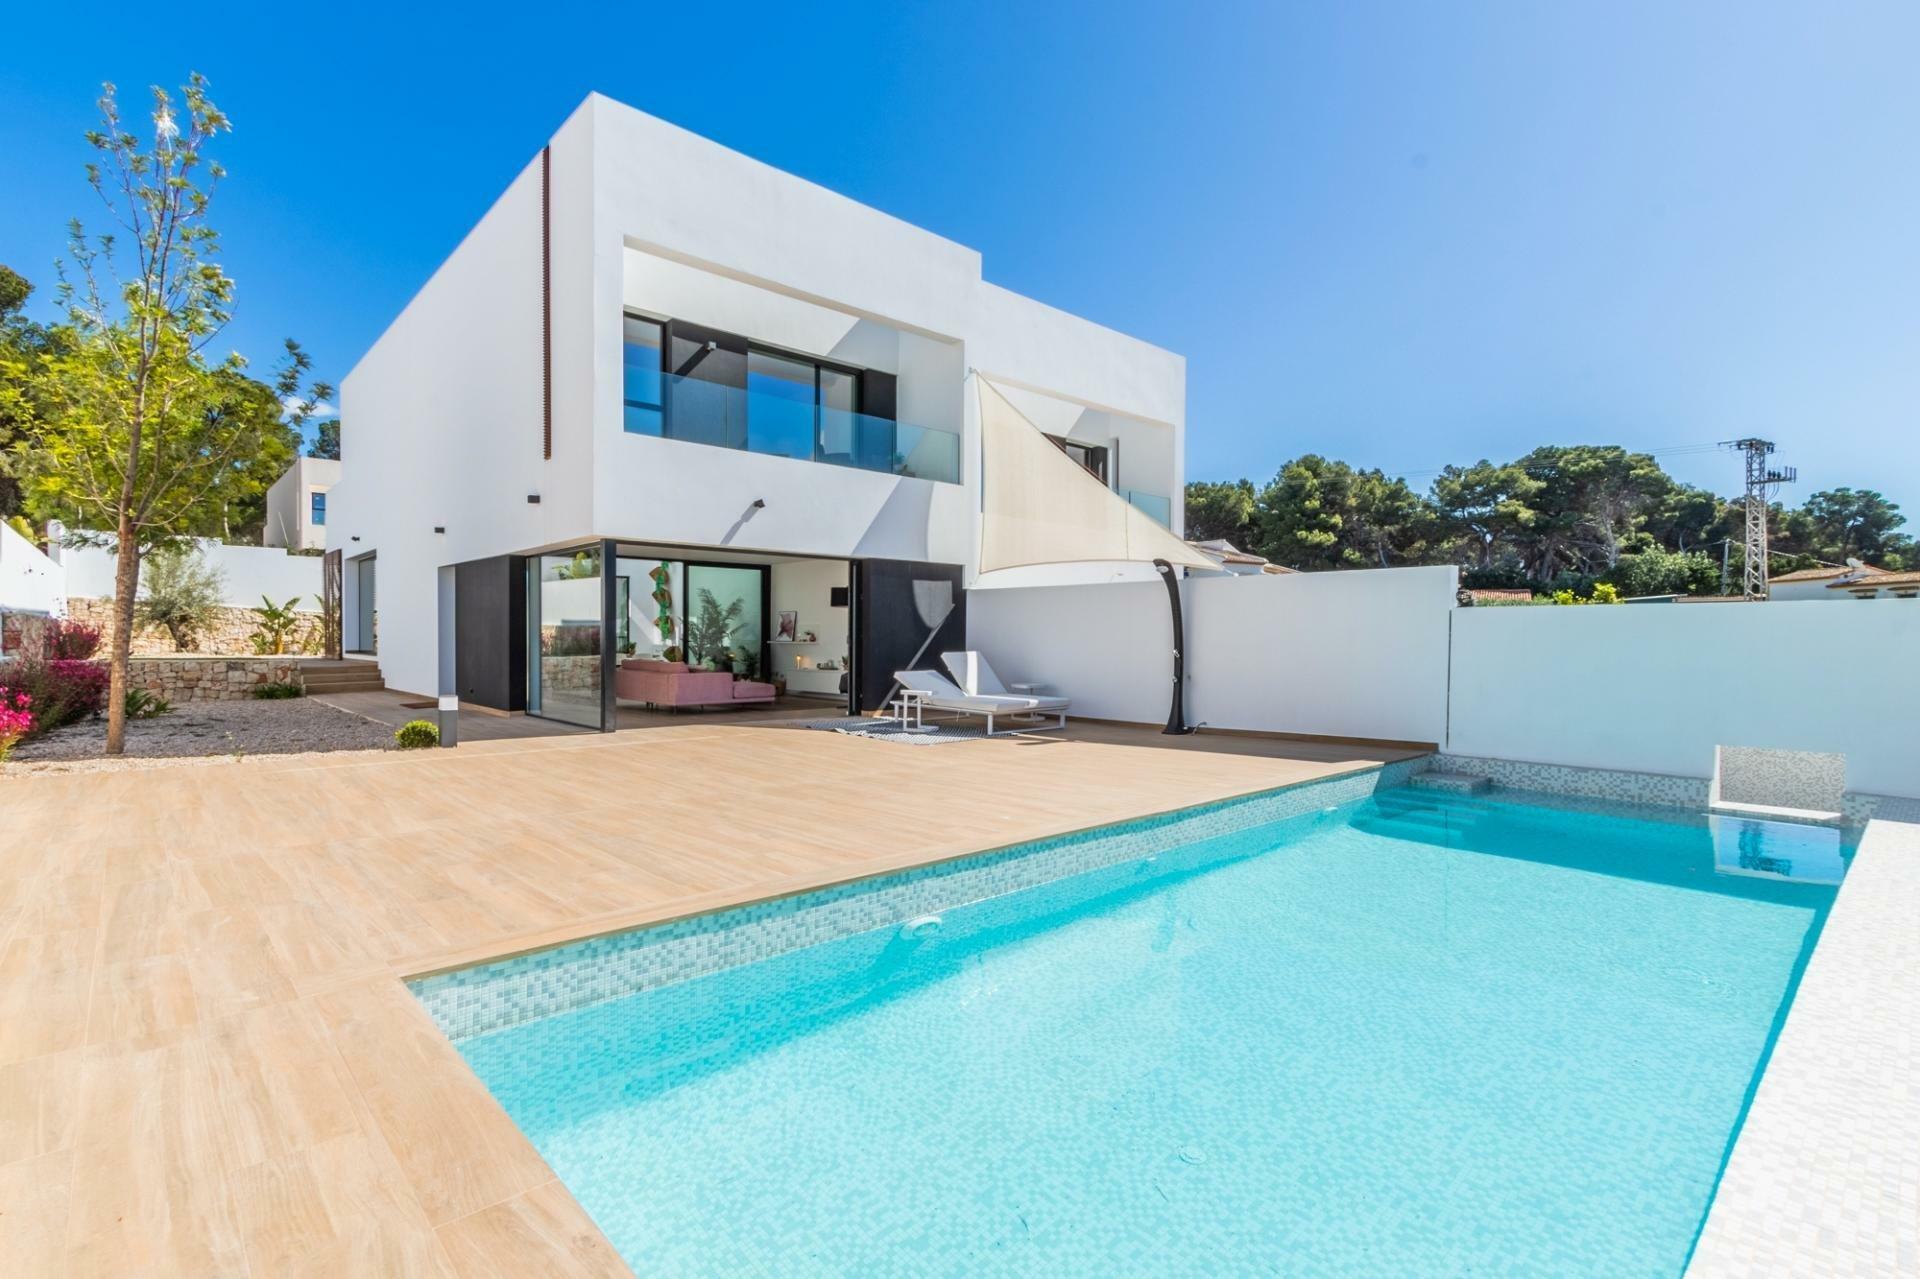 Apartment in Teulada, Spain, Valencian Community, Spain 1 - 11253322